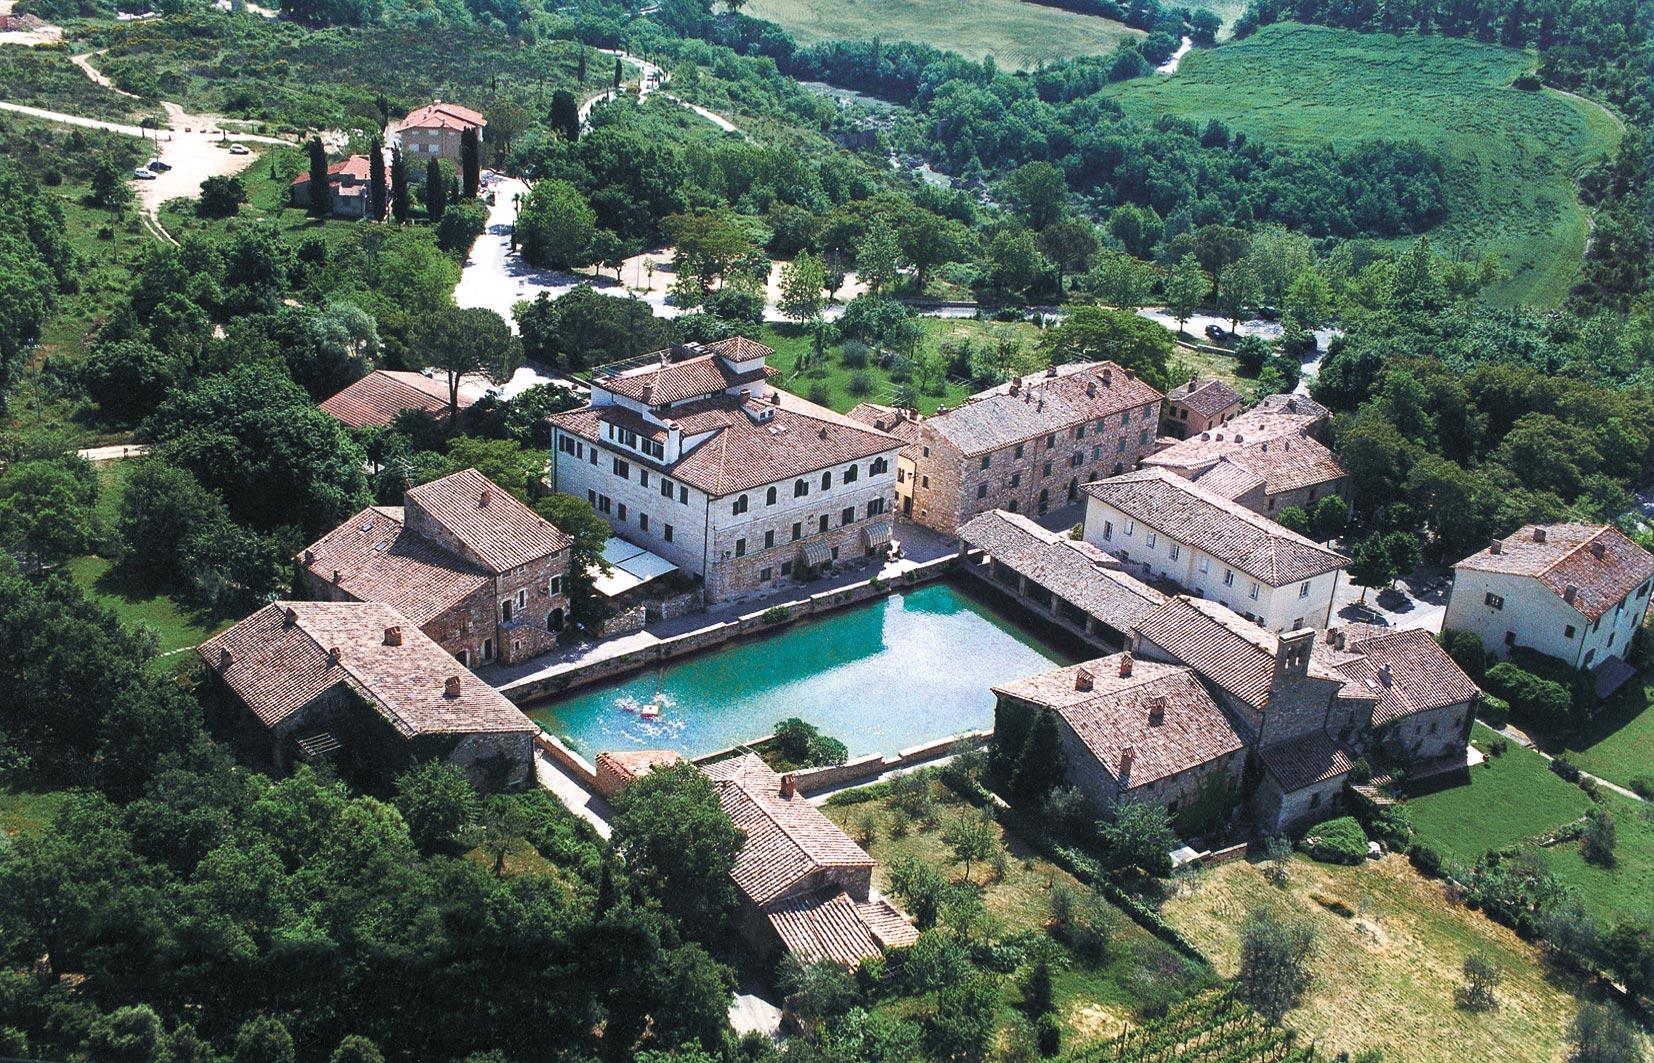 Termy Bagno Vignoni Toskania Val d'Orcia Tuscany